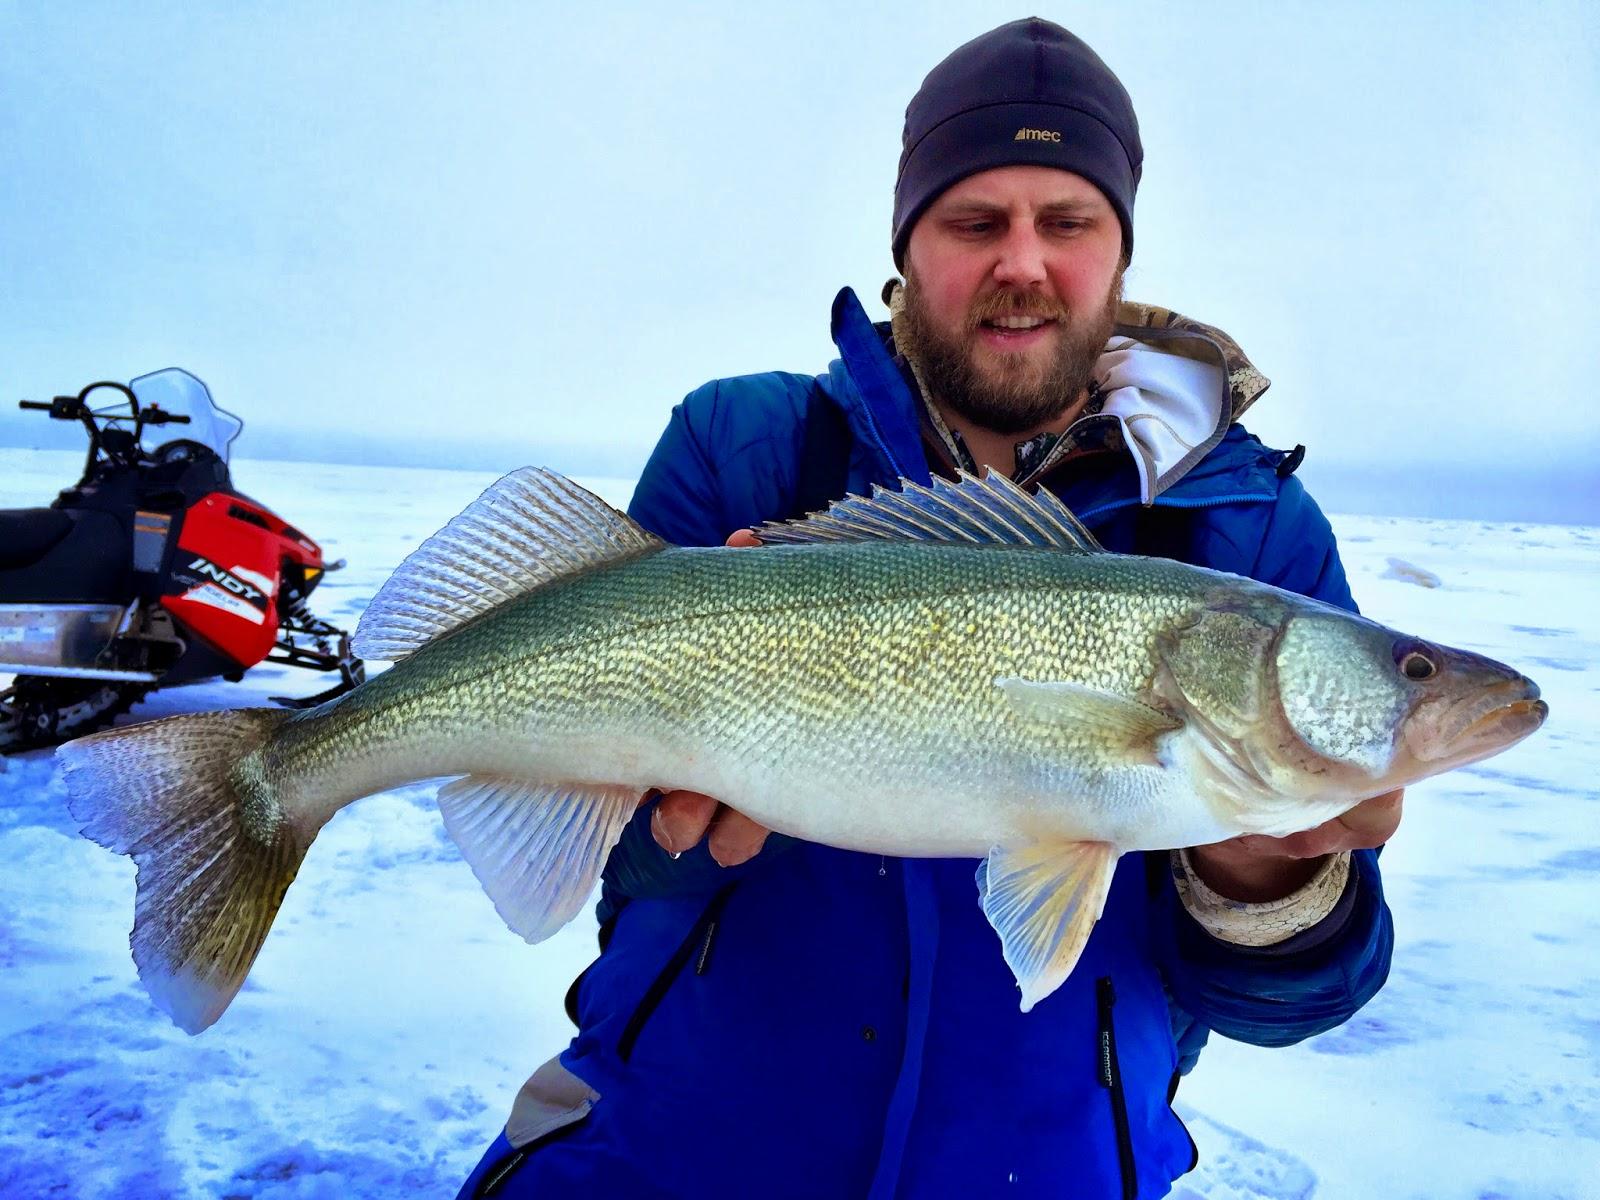 Jason hamilton outdoors jumping cracks on lake winnipeg for Lake winnipeg fishing report